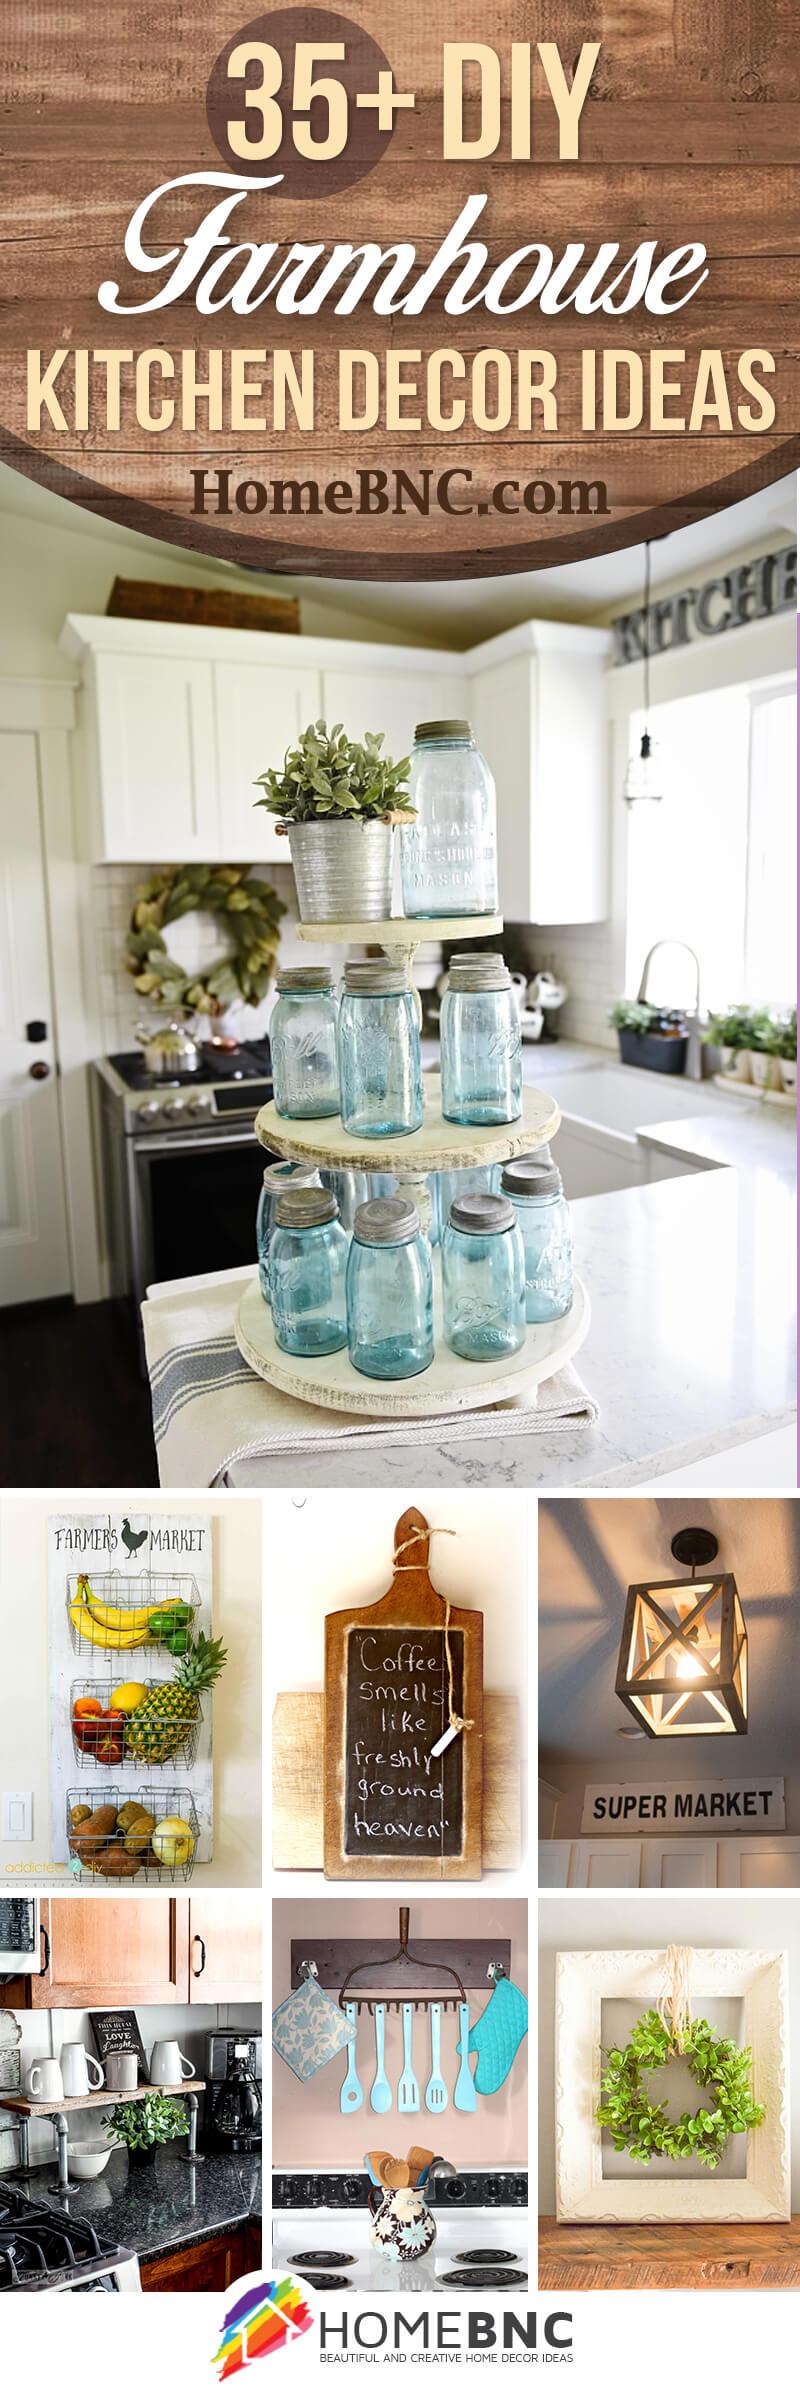 35+ Best DIY Farmhouse Kitchen Decor Projects and Ideas ... on Rustic:yucvisfte_S= Farmhouse Kitchen Ideas  id=80908